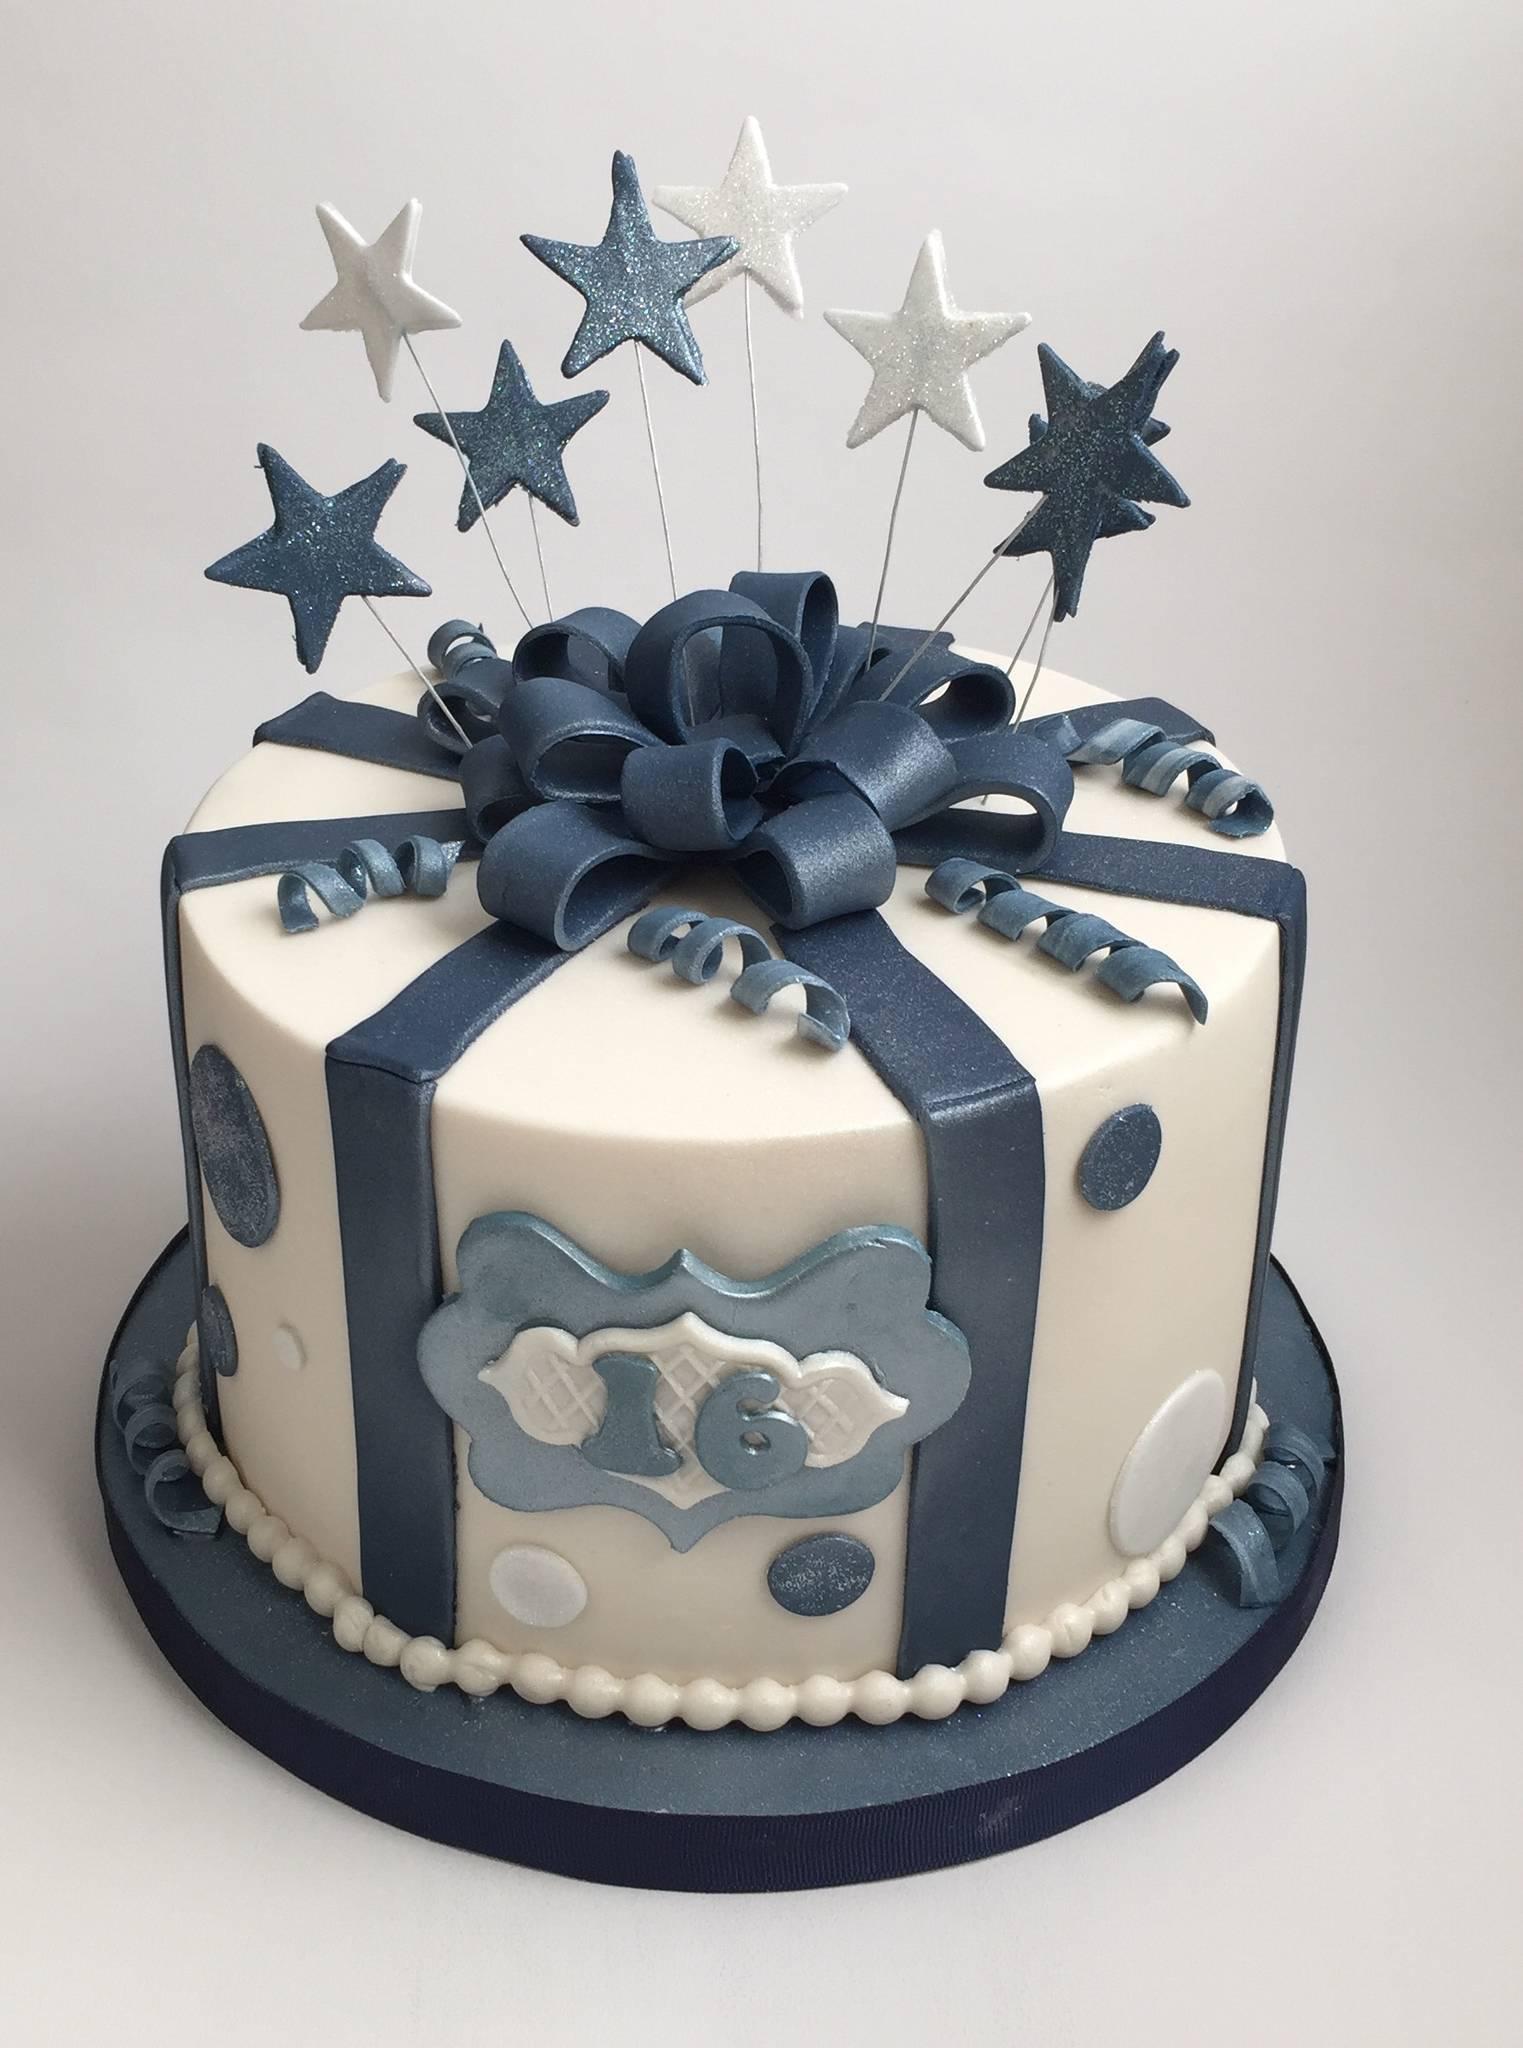 16th Birthday Cakes For Guys Cake Recipe